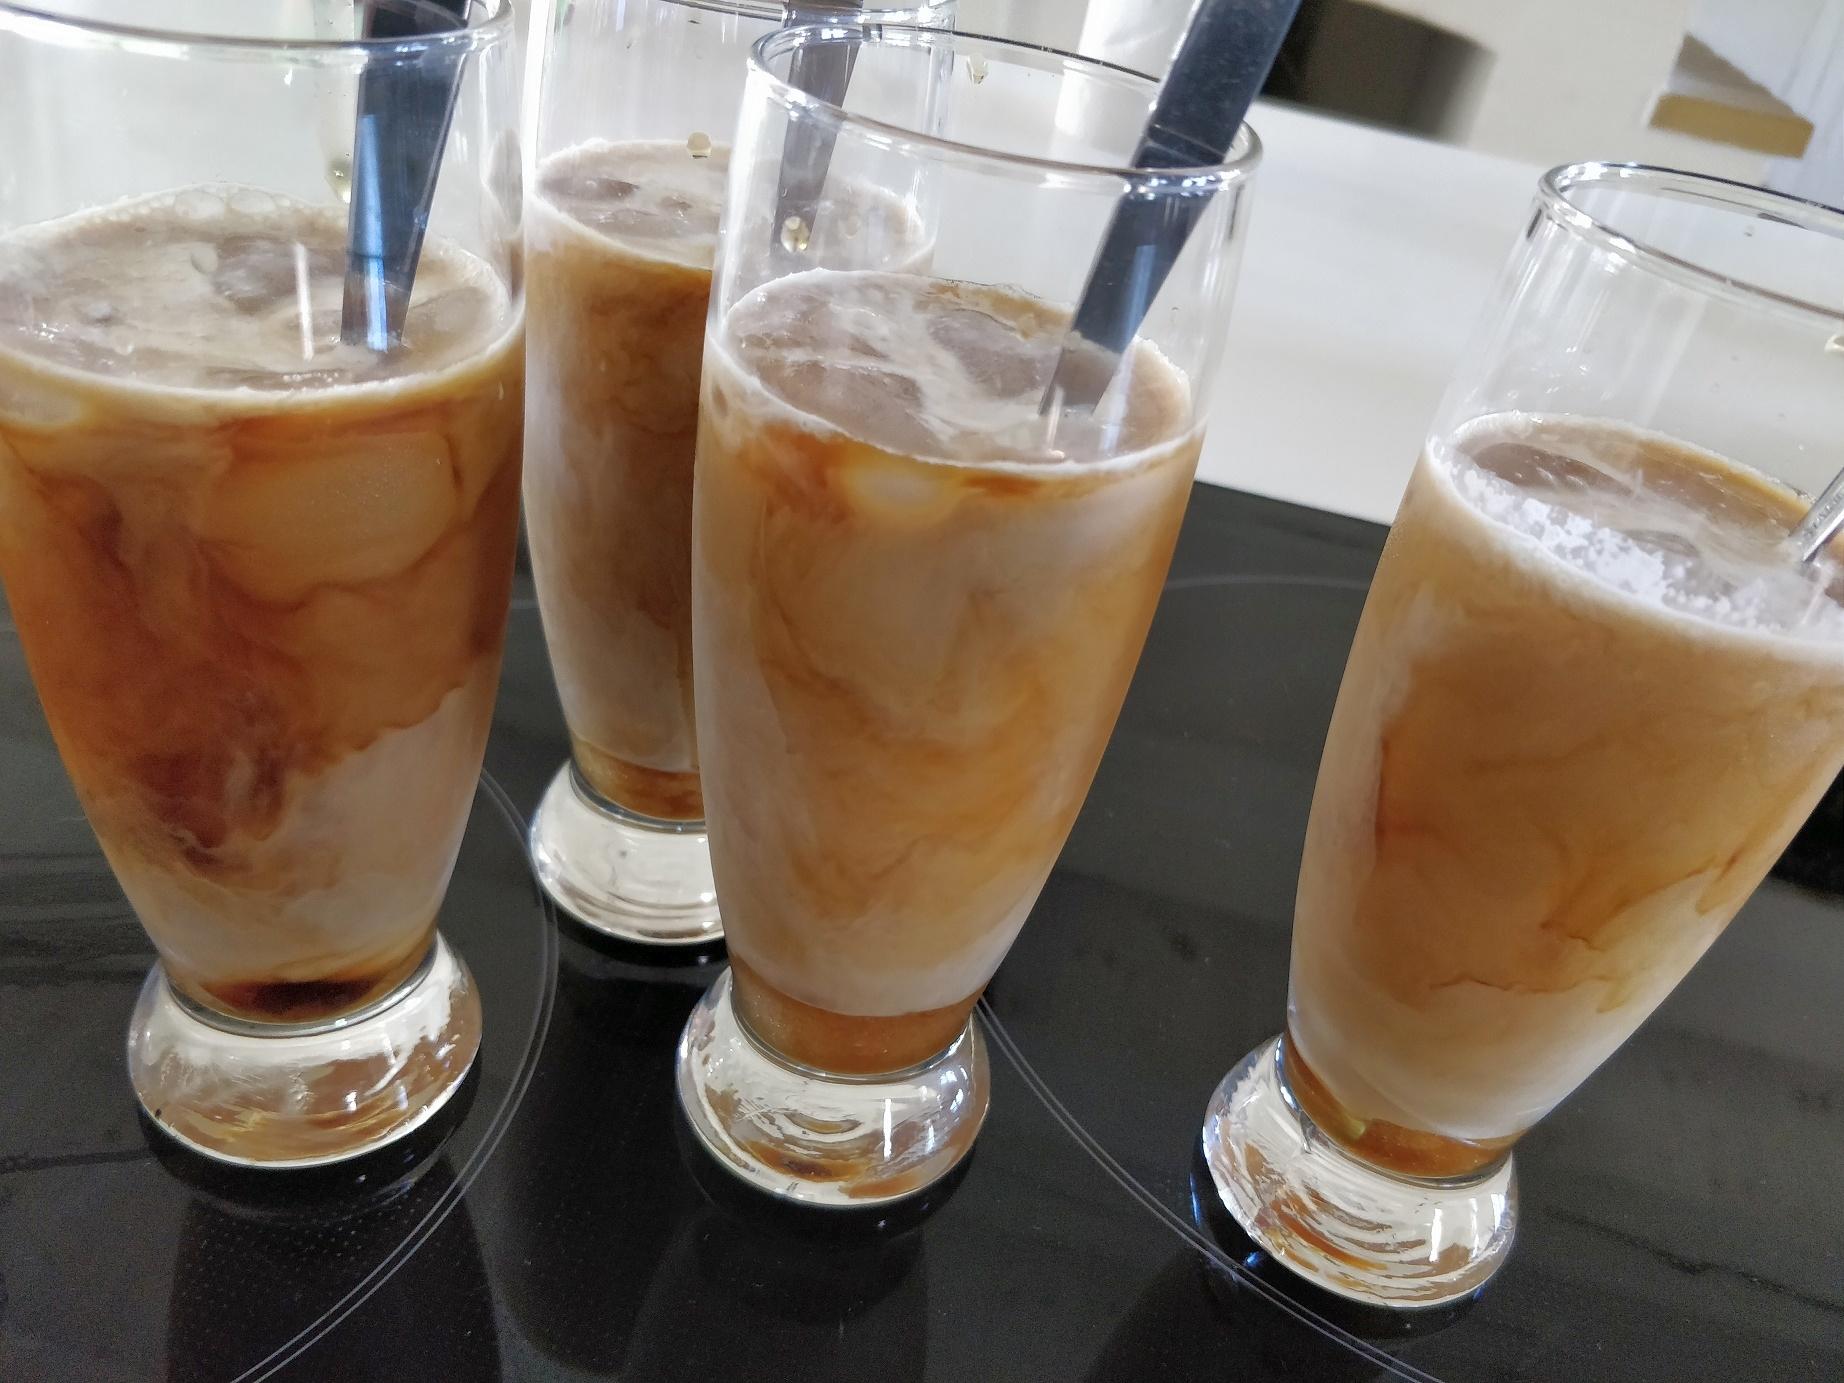 Iskaffe med coldbrew og fløde